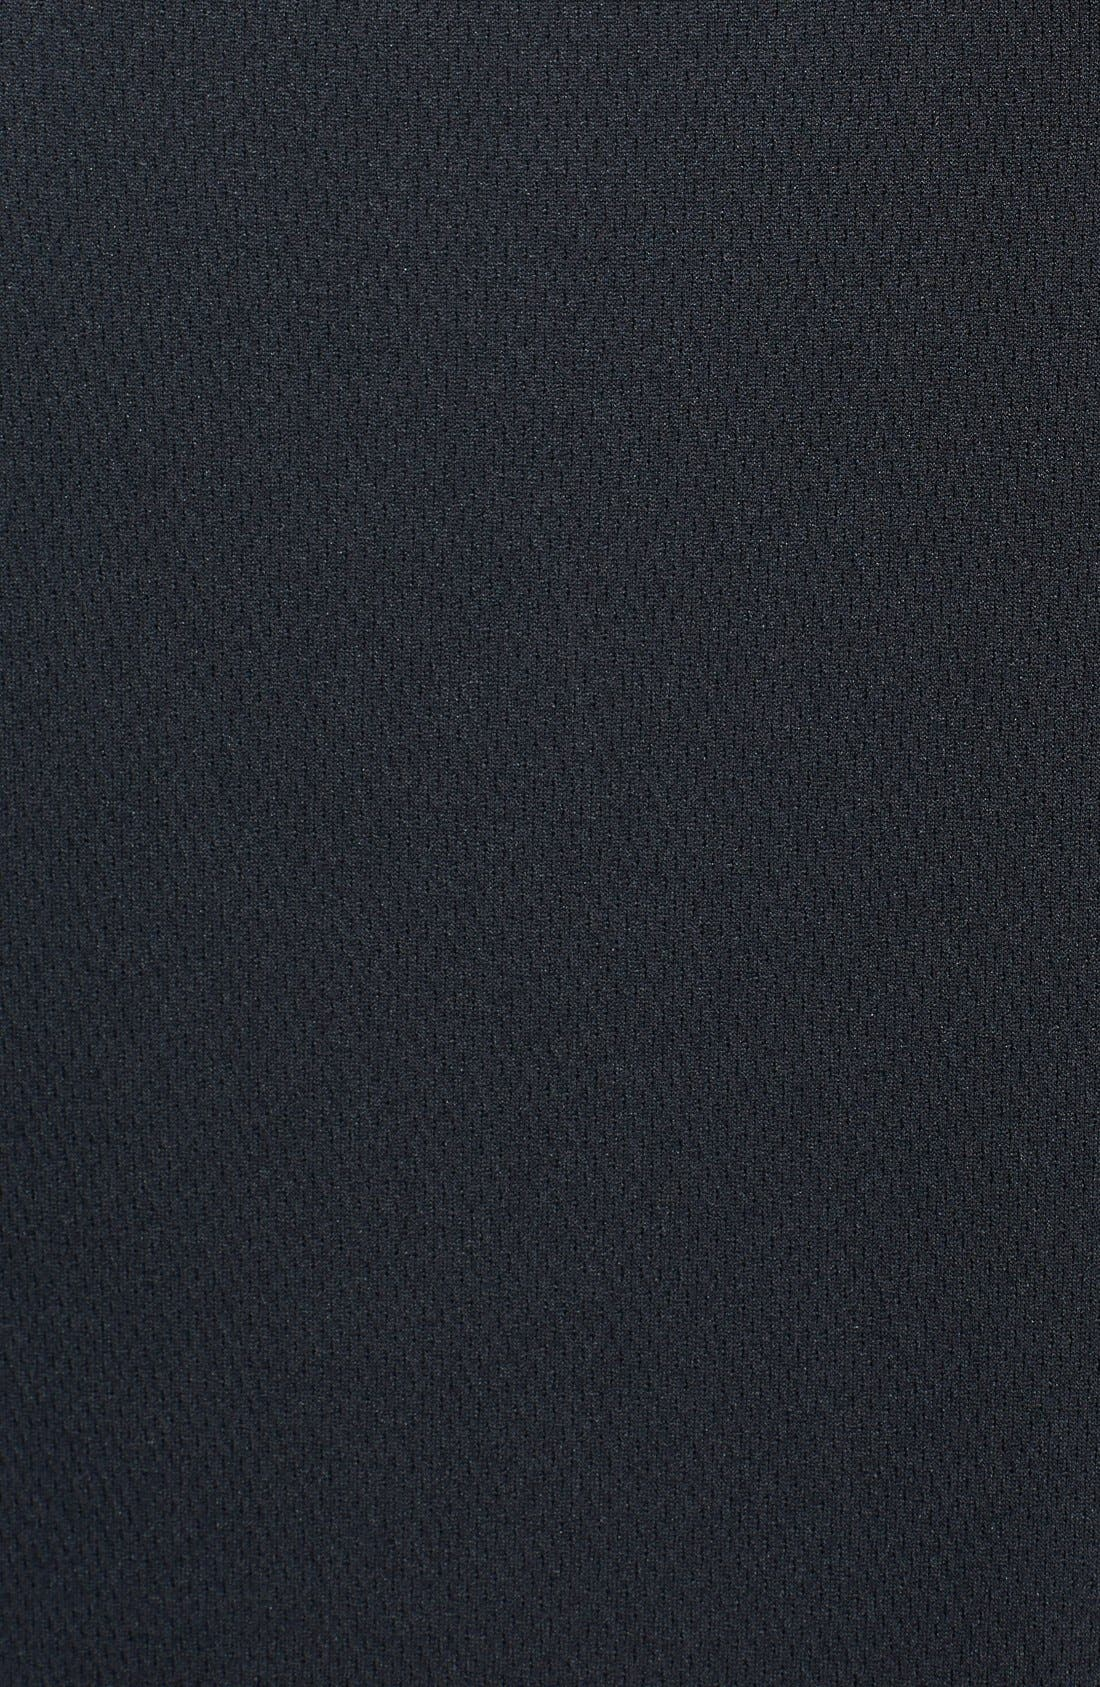 Cincinnati Bengals - Edge DryTec Moisture Wicking Half Zip Pullover,                             Alternate thumbnail 3, color,                             Black